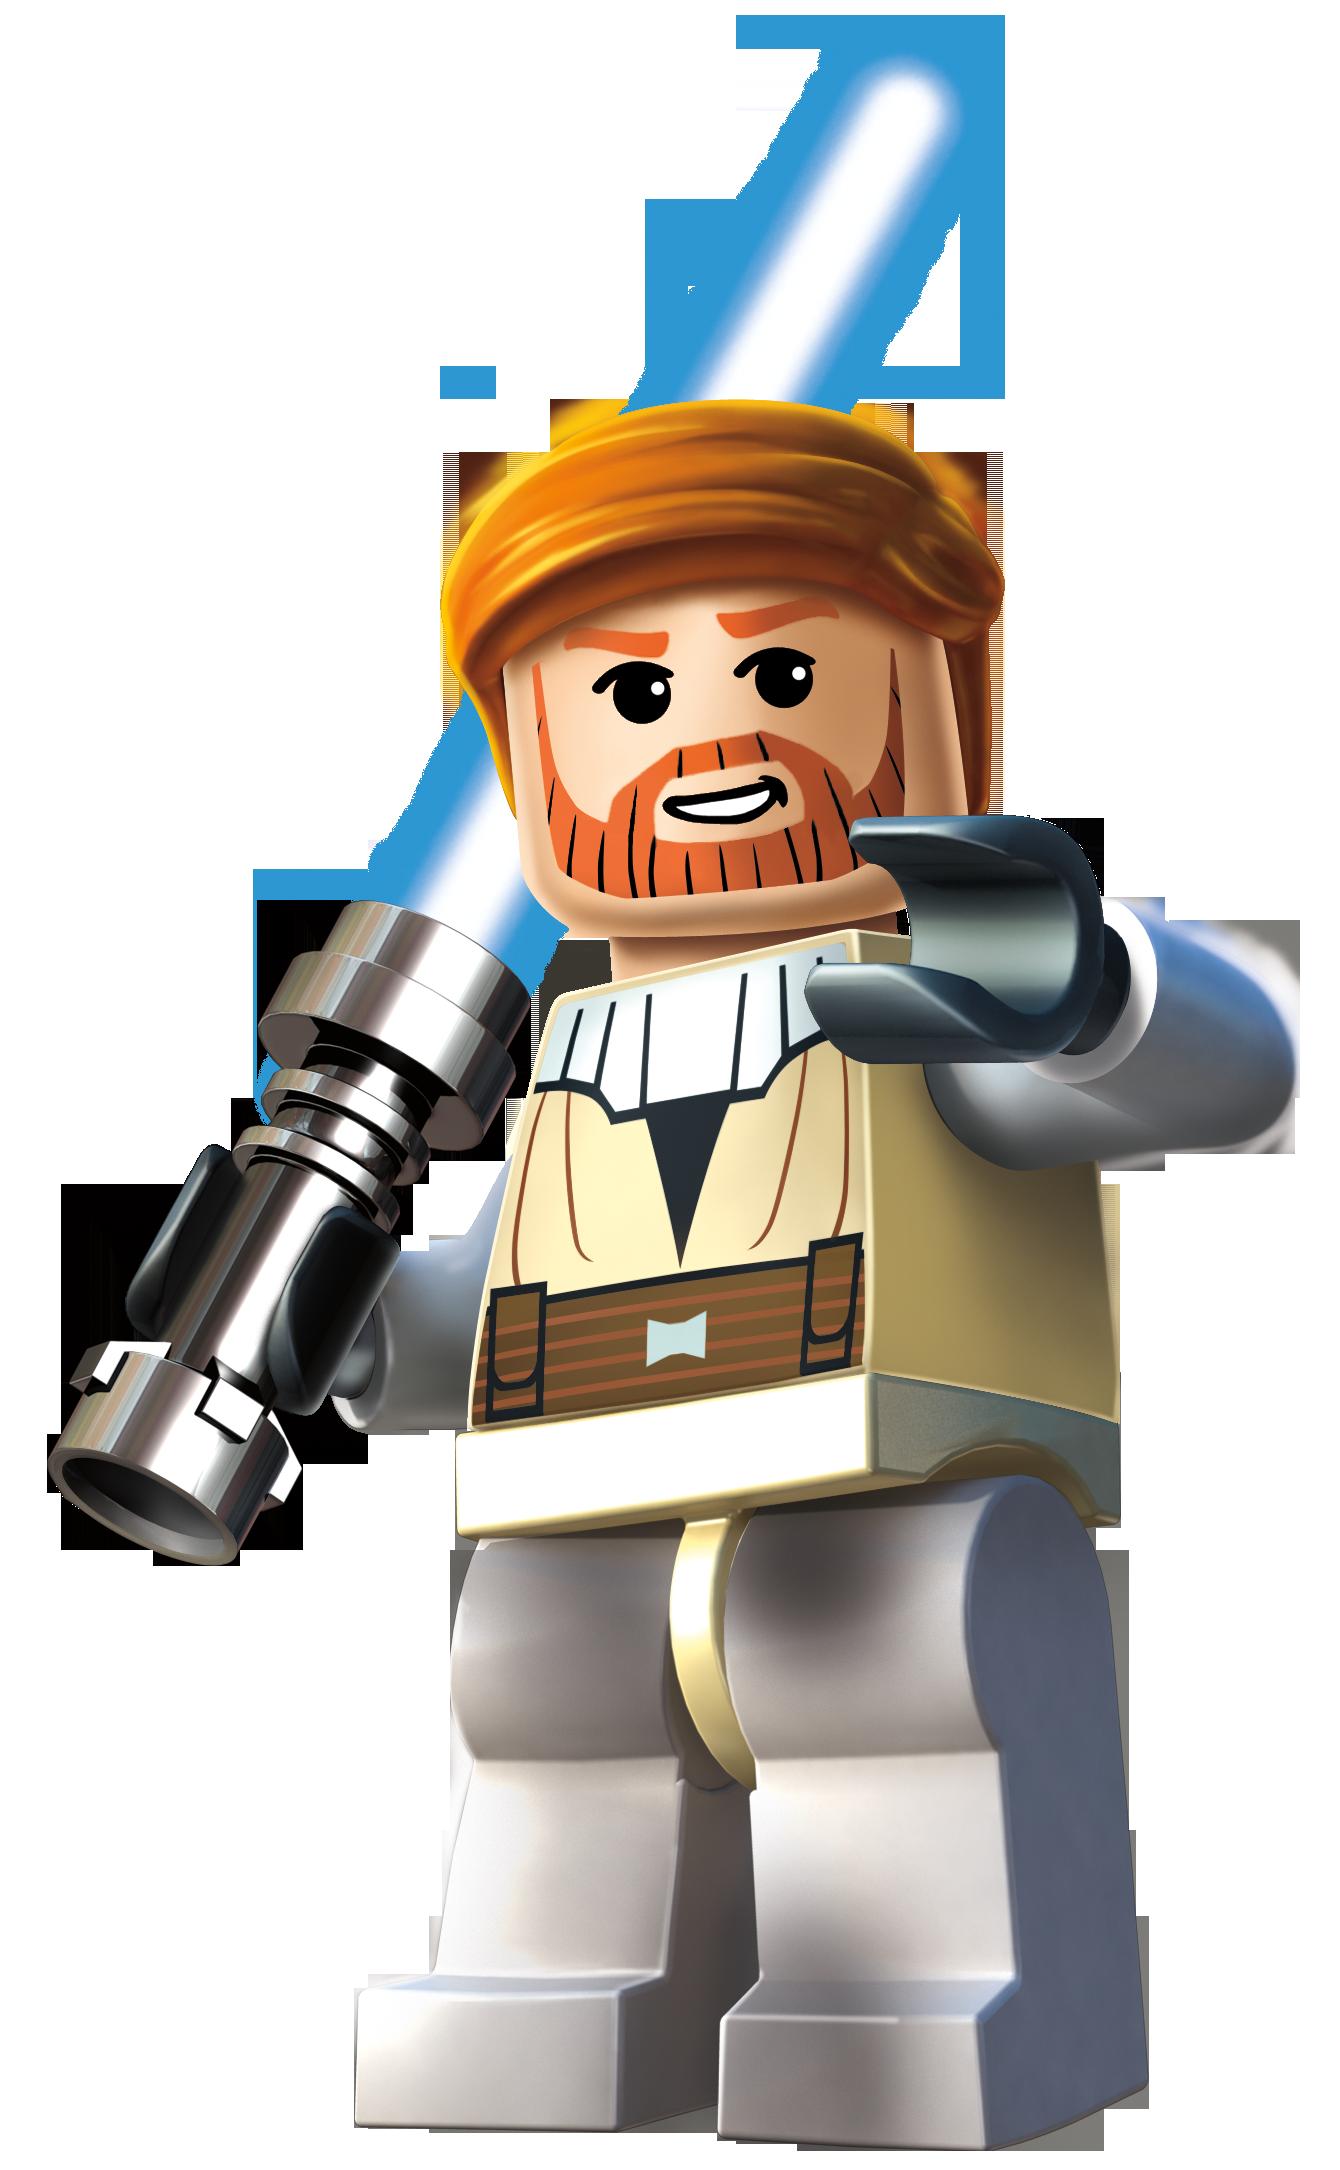 Dal decollo al docking step-by-step (+ video) - Pagina 3 Obi-Wan_LSW3